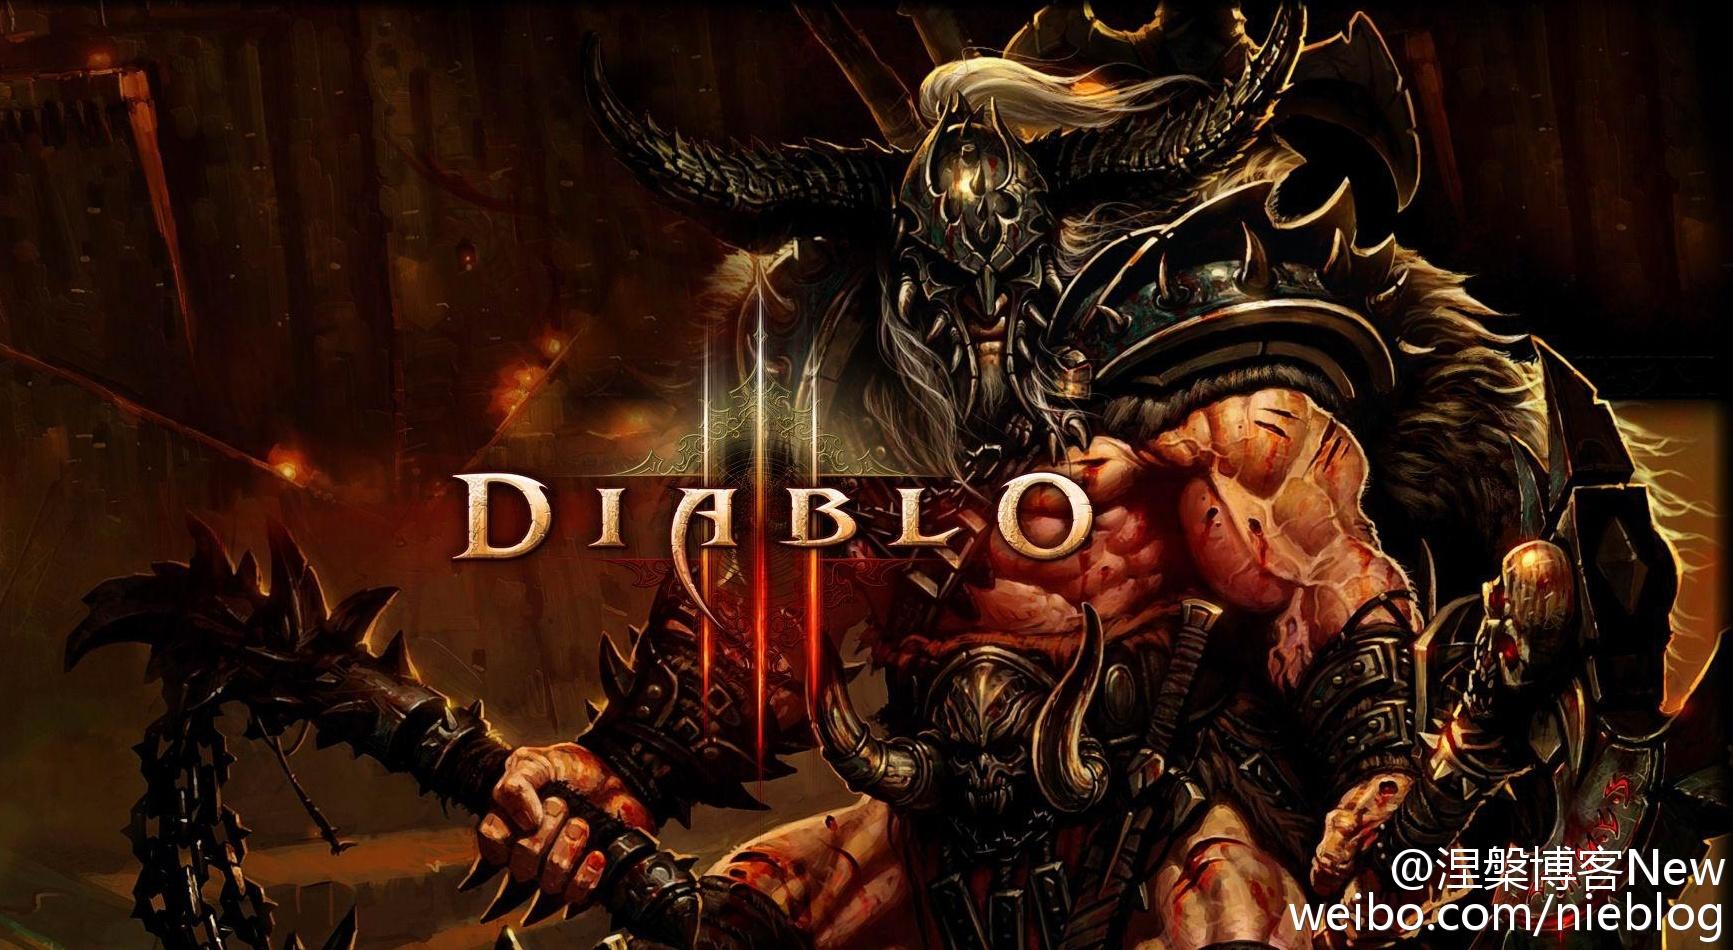 WOW第三资料片官方中文介绍视频+Diablo III 12分钟僧侣试玩演示视频-涅槃茶馆